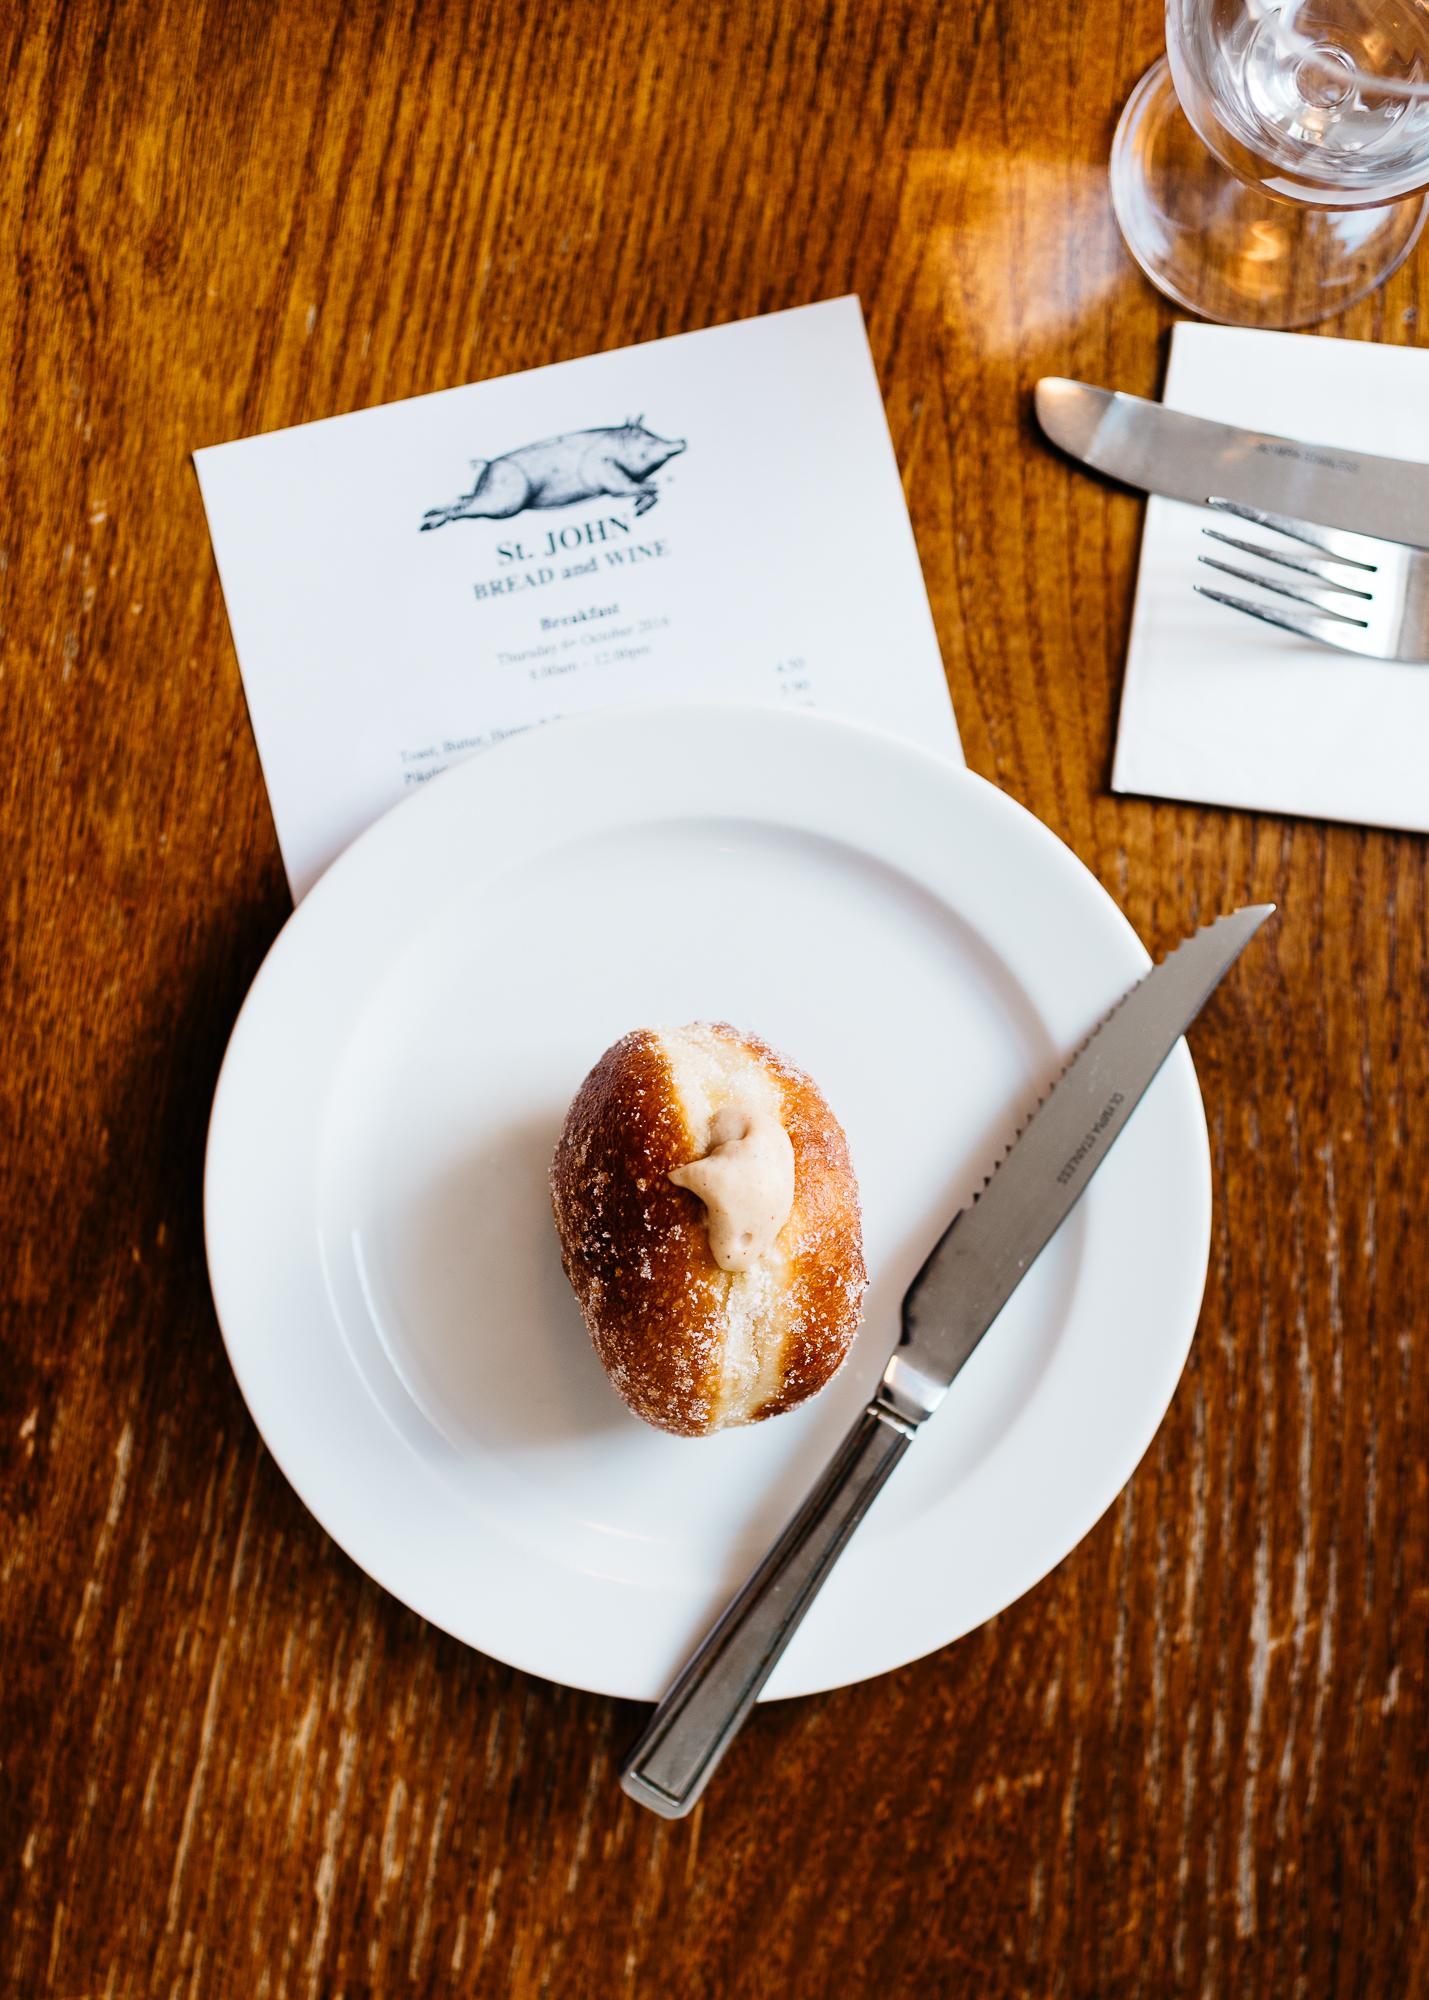 Apple cider doughnut from St. John Bread & Wine